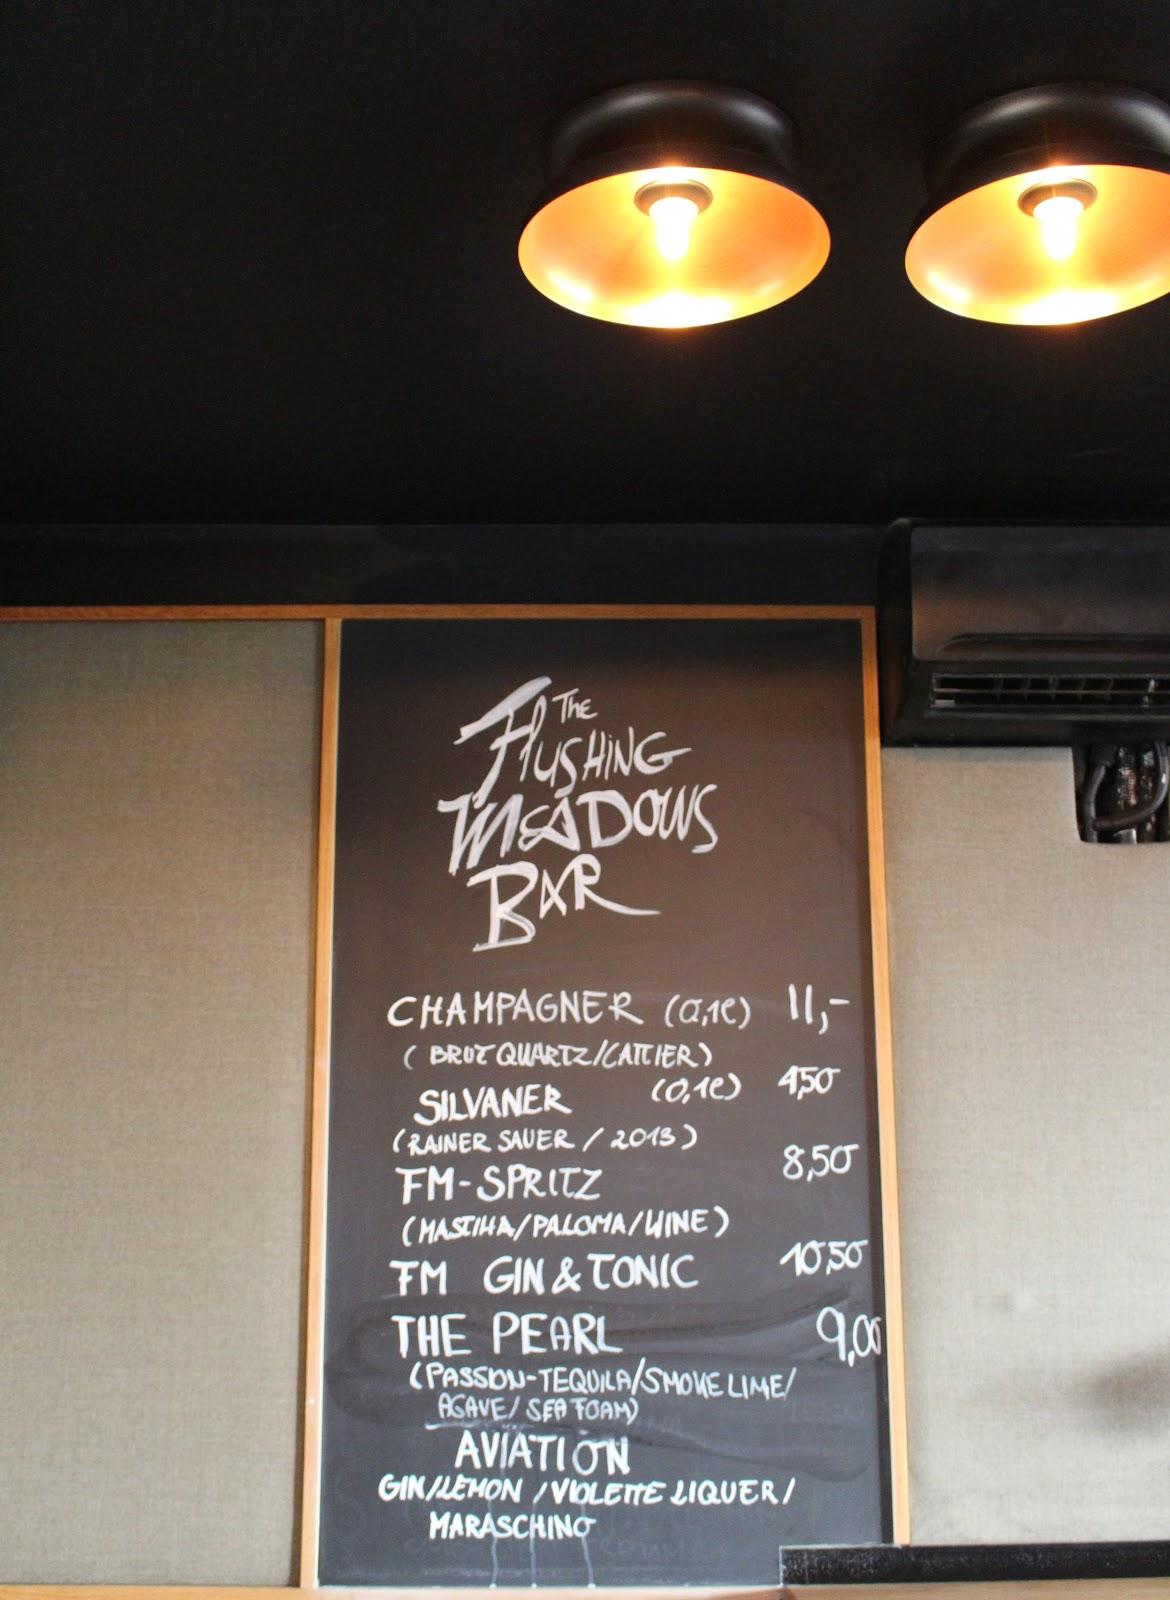 The Flushing Meadows Hotel & Bar menu